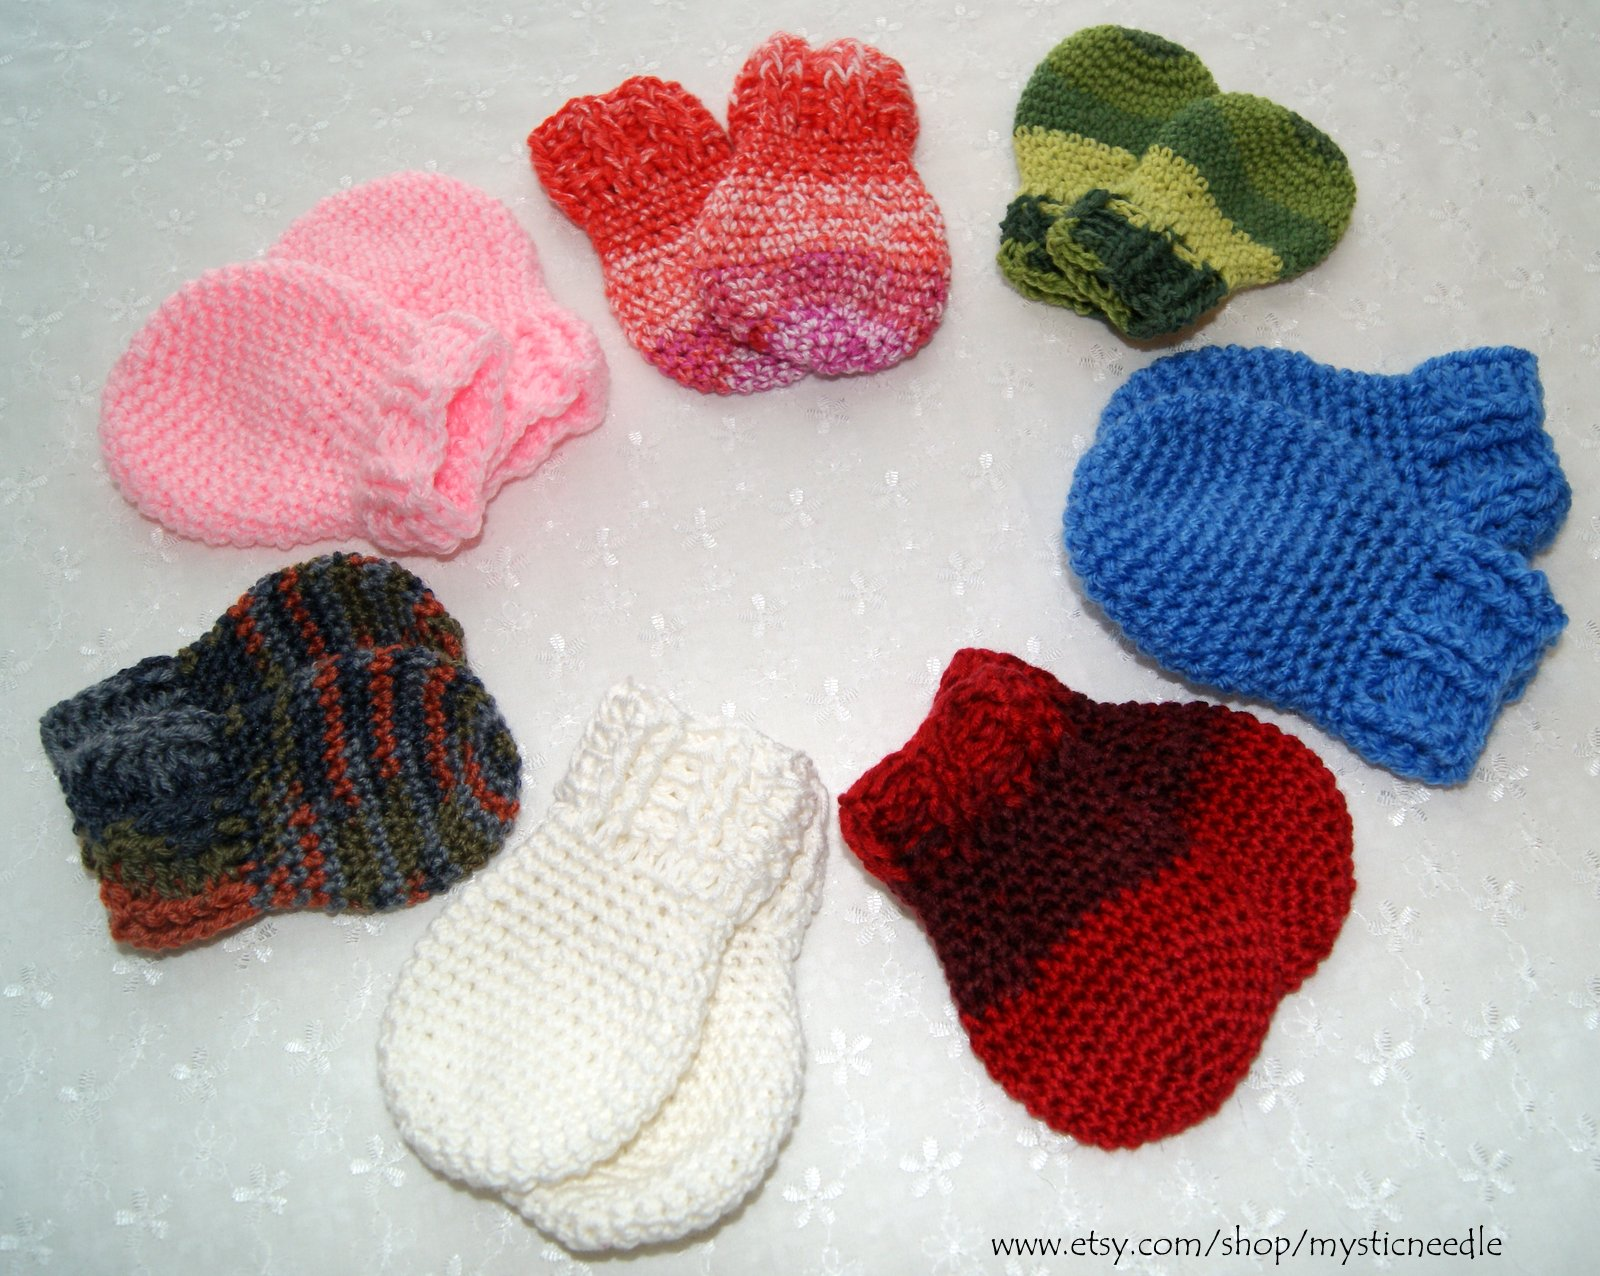 Crochet Thumbless Mittens Stitch4ever